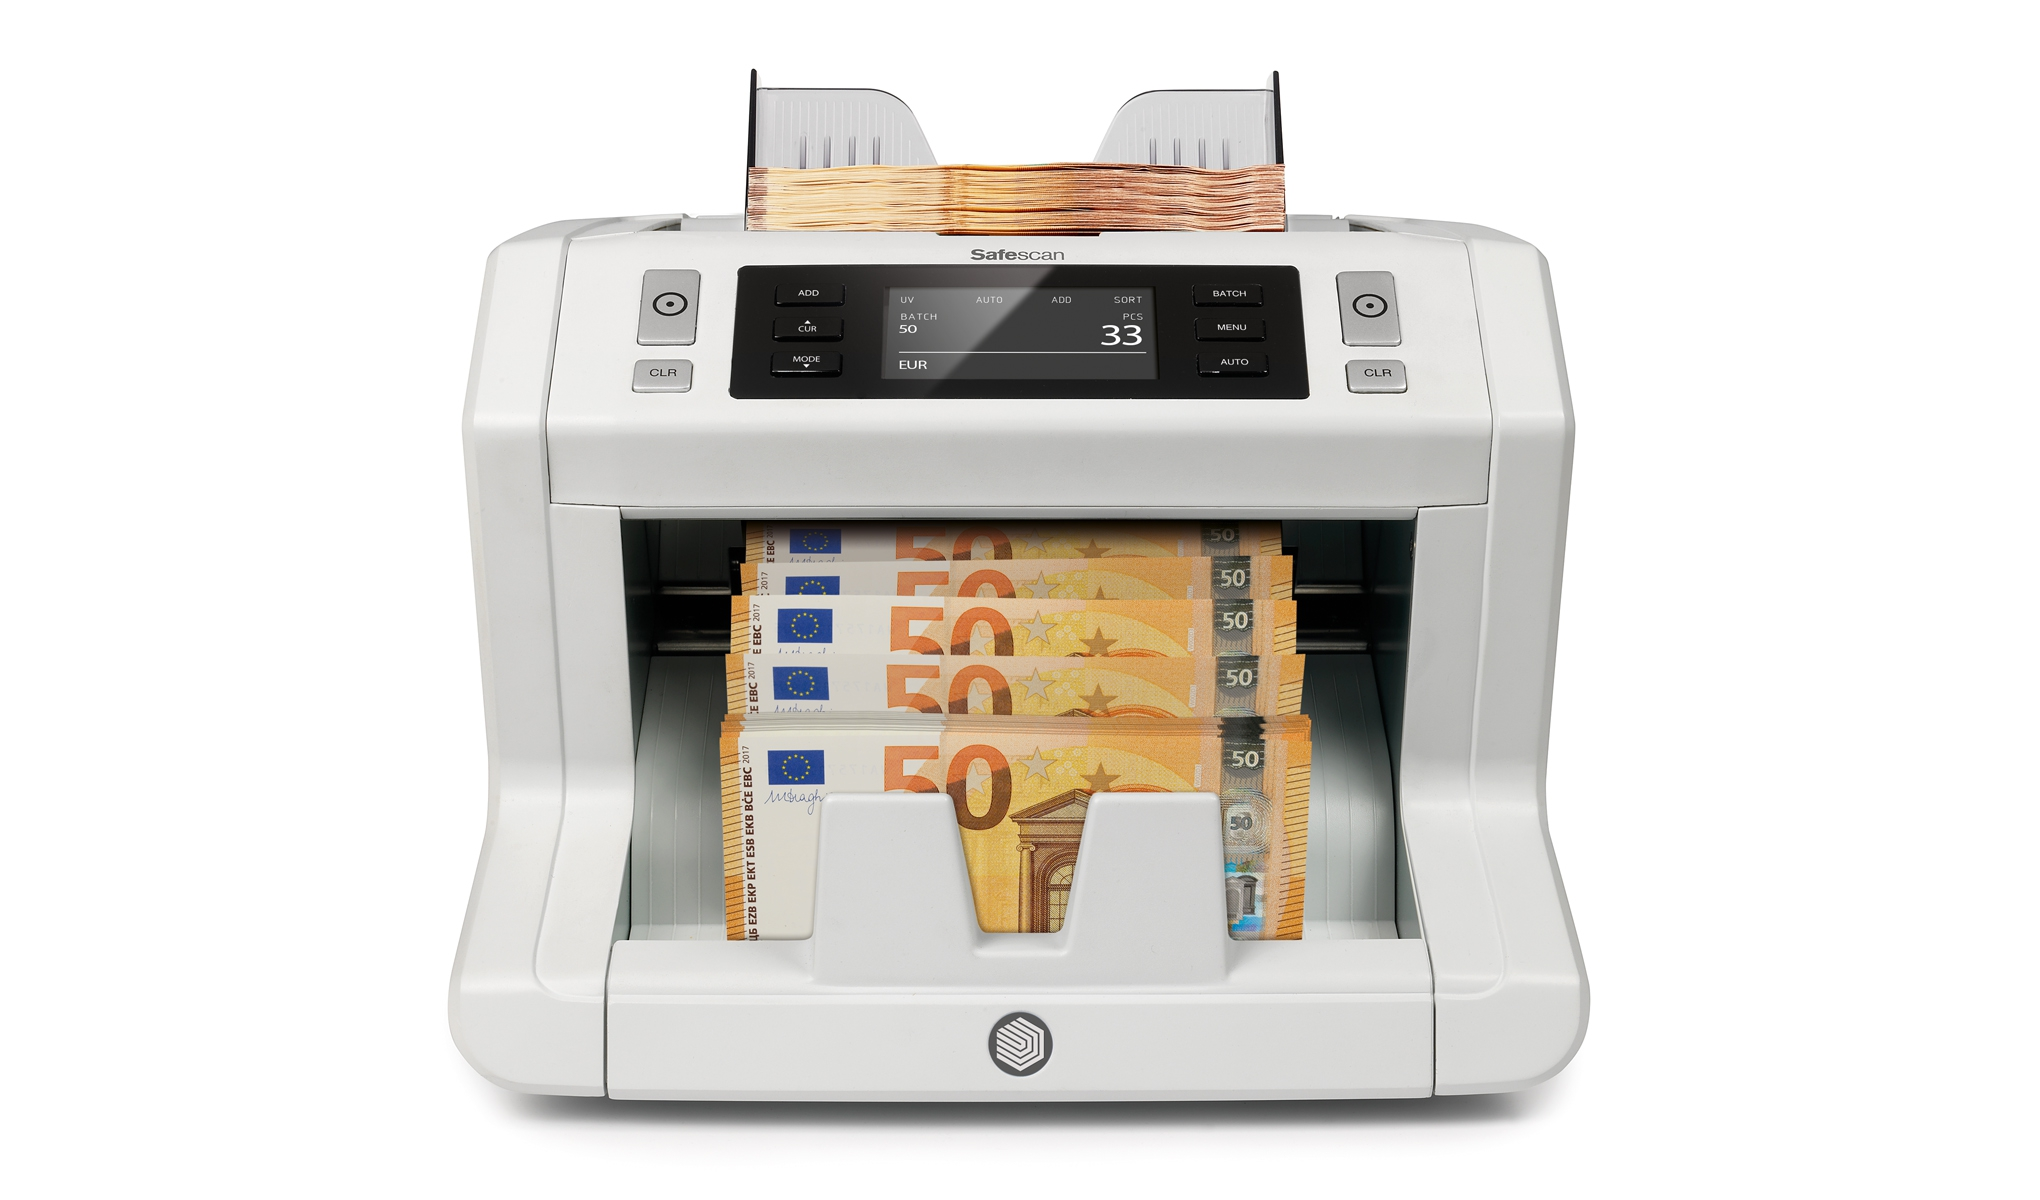 safescan-2680-banknote-counter